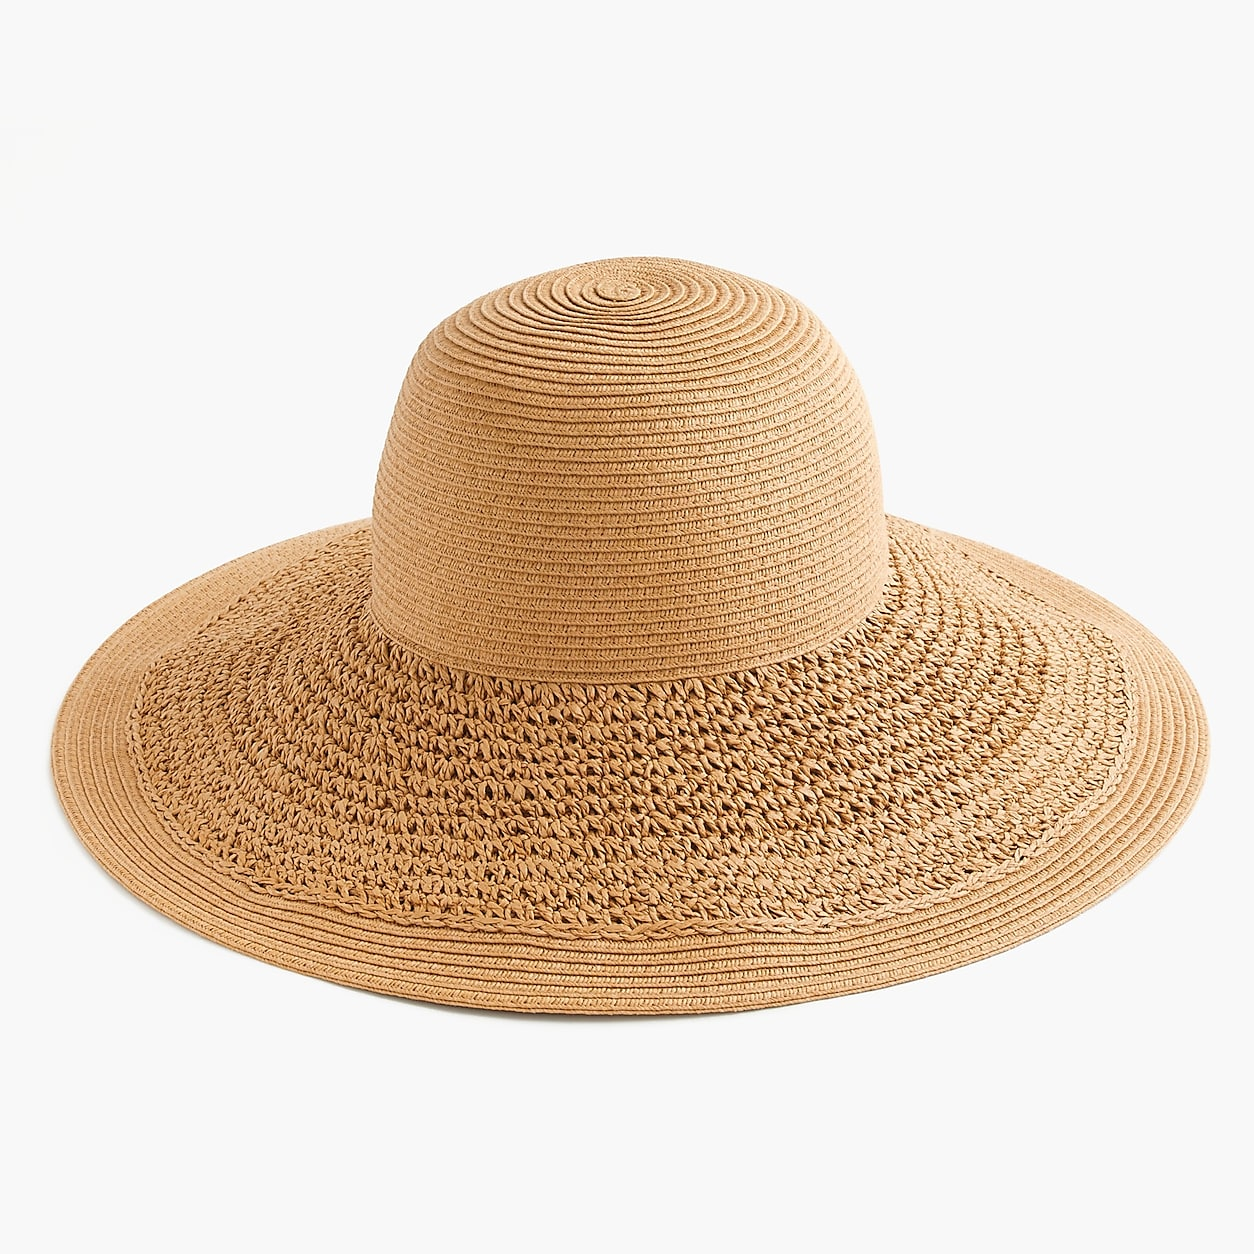 6c19baa2e84 Textured Summer Straw Hat